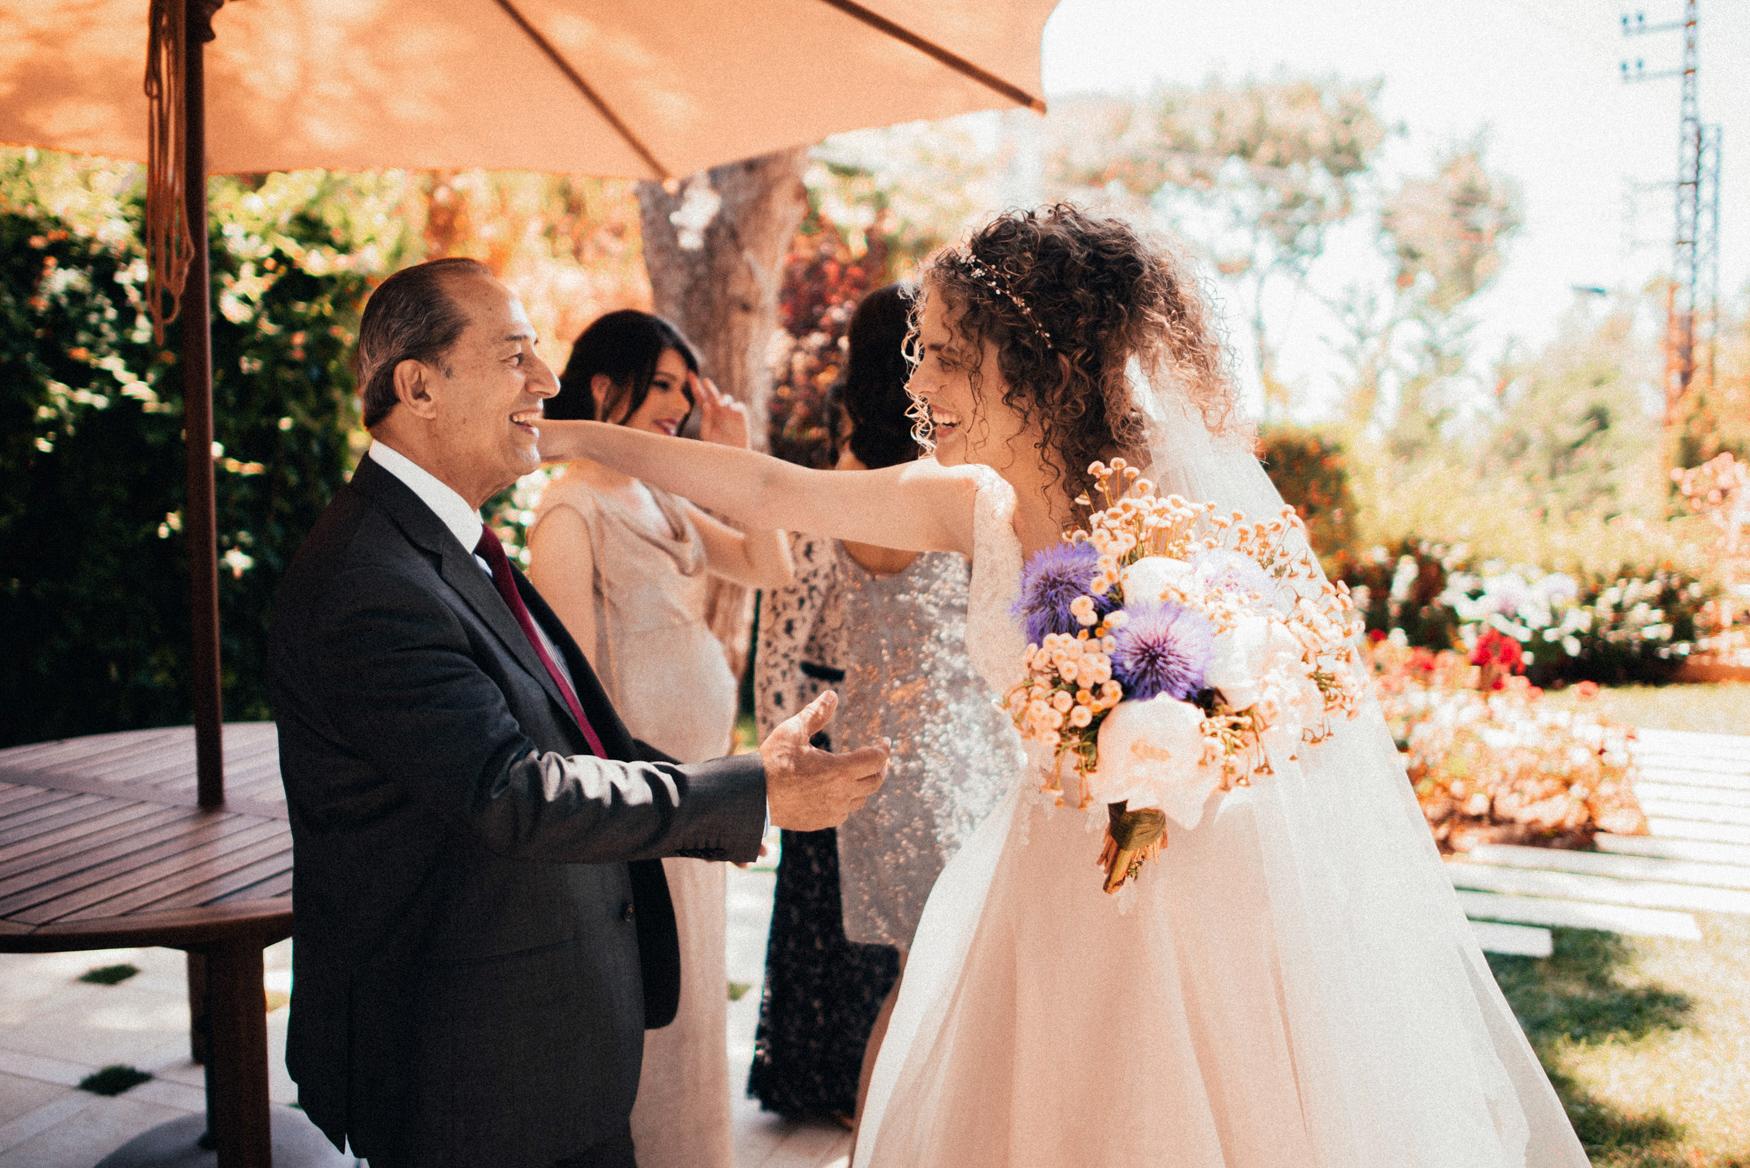 LR2 beirut byblos wedding photographer lebanon 023.jpg